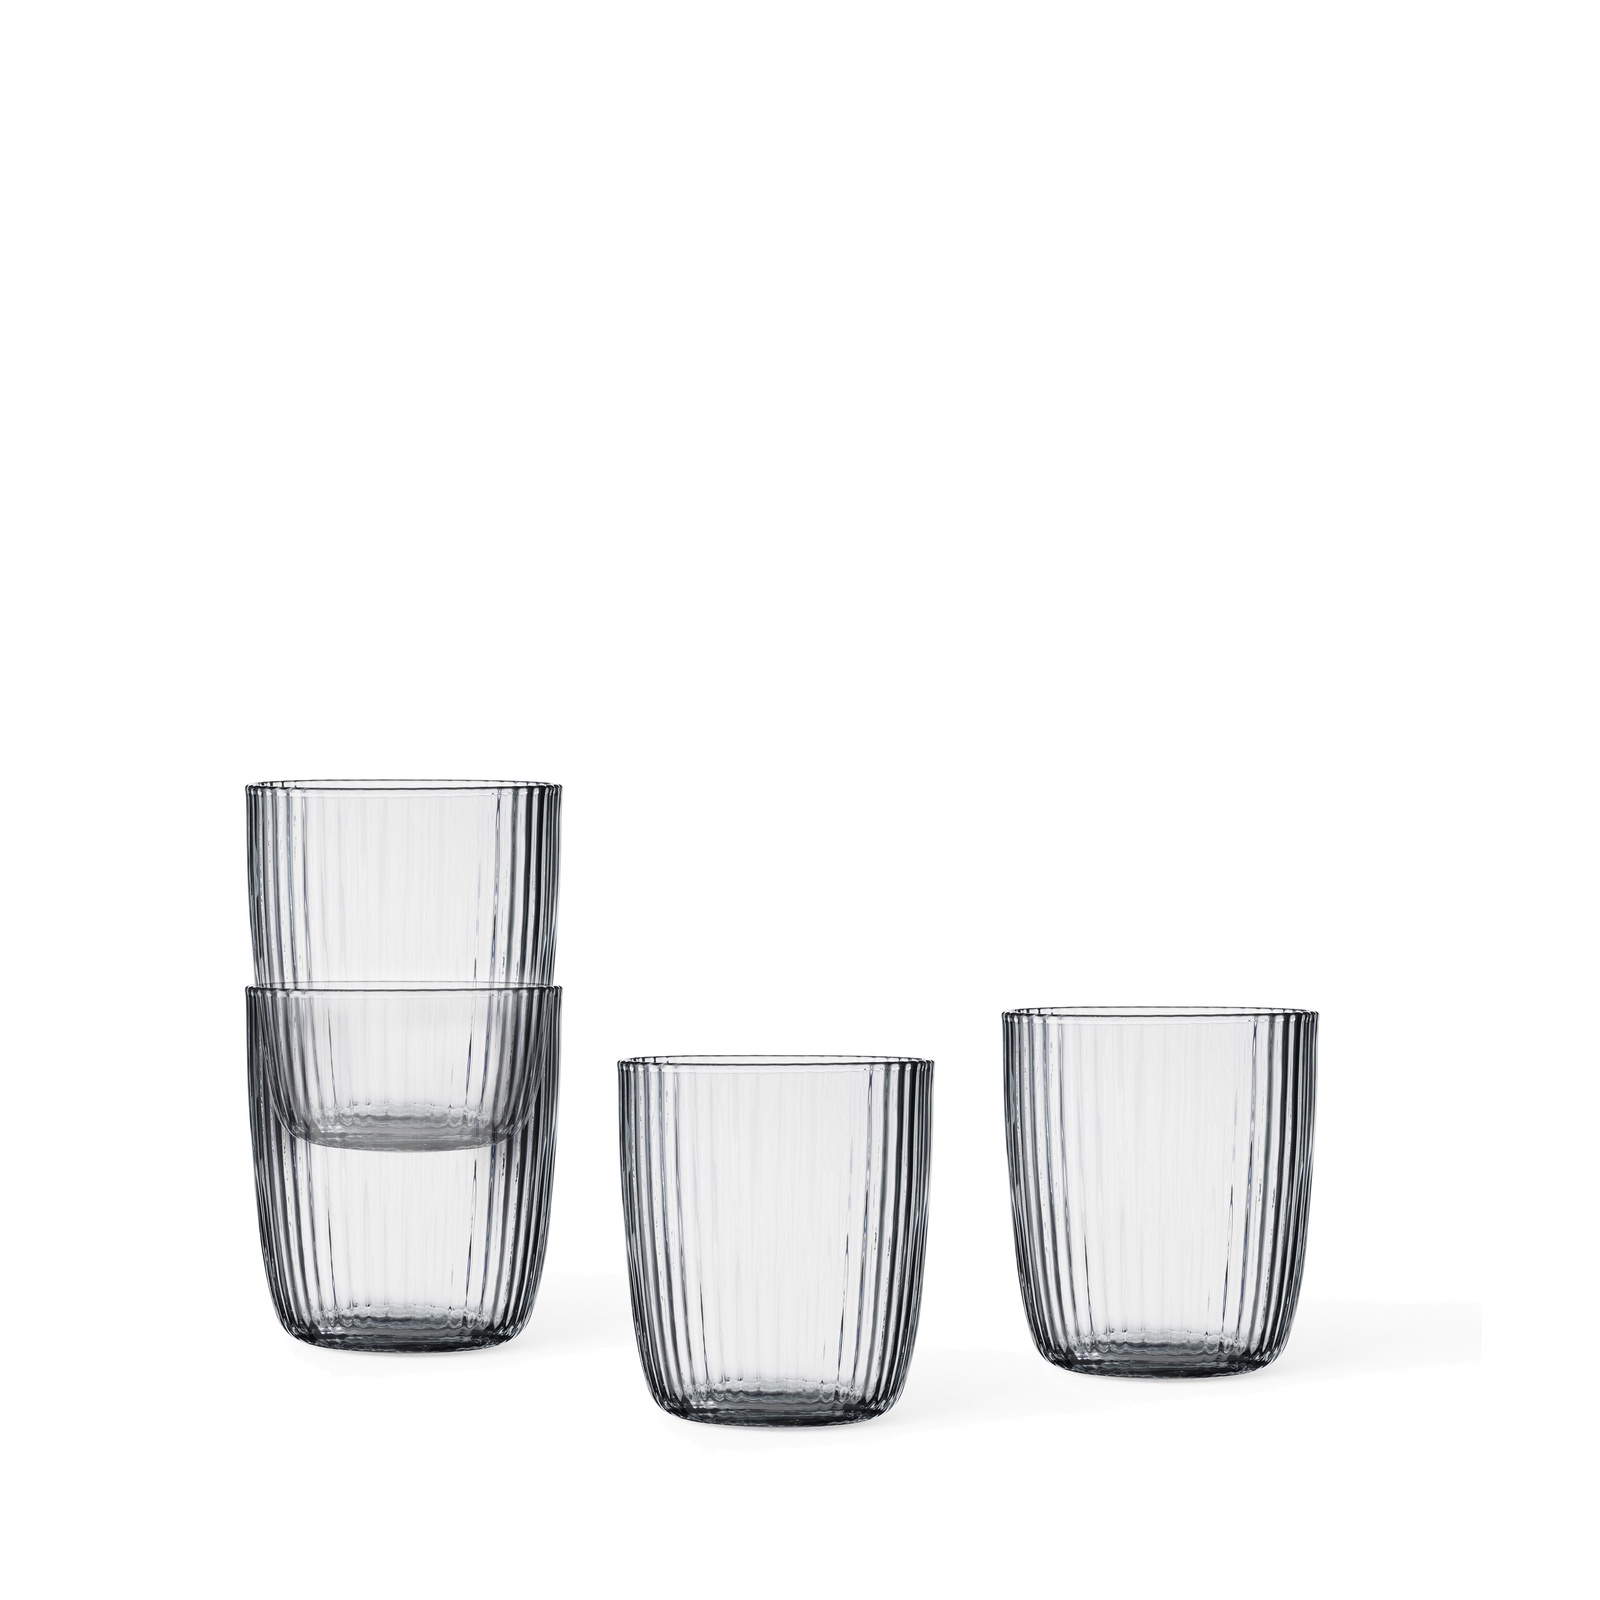 Набор стаканов Viva scandinavia Christian, V79200, прозрачный, 4 шт, 250 мл